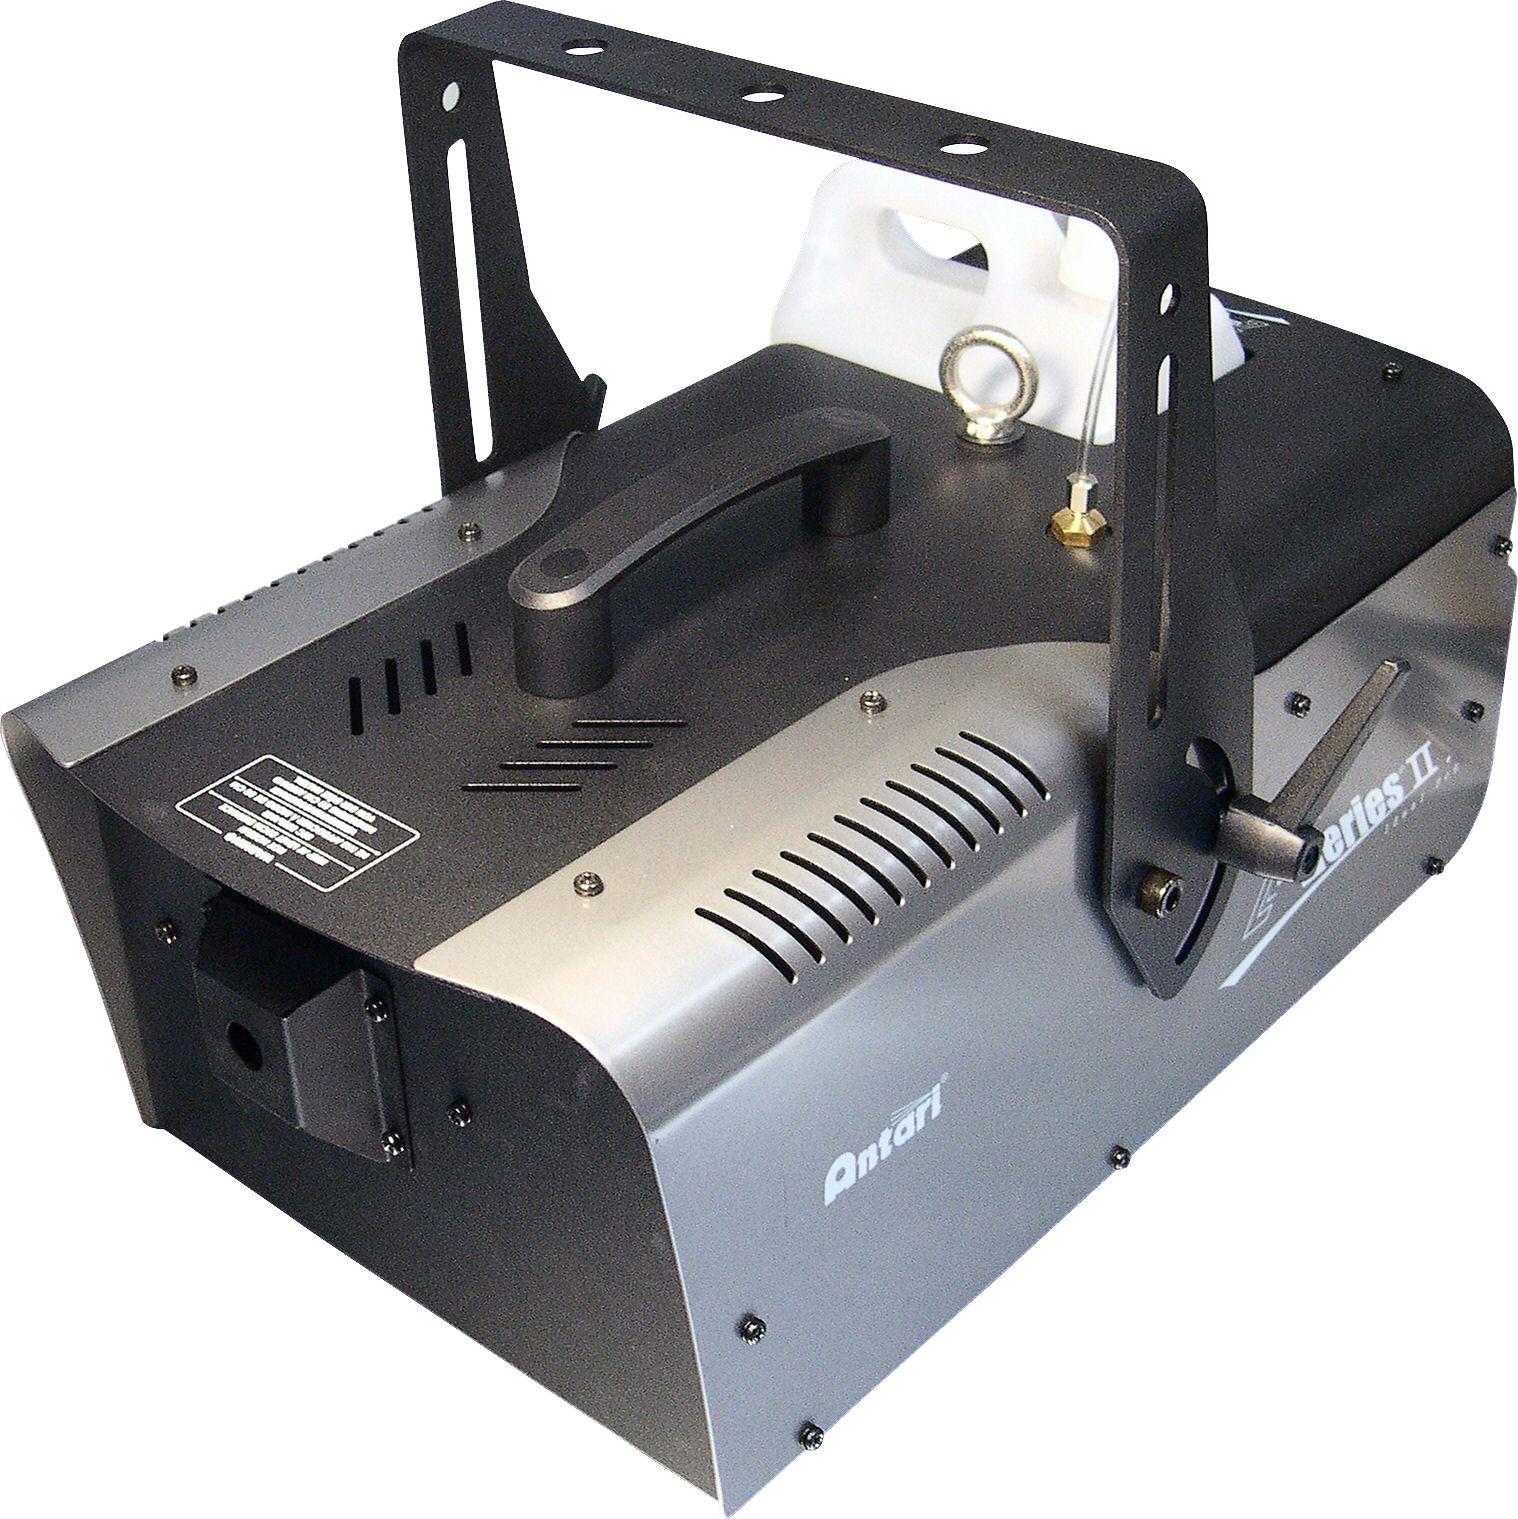 ANTARI Z-1200 II Fog Machine